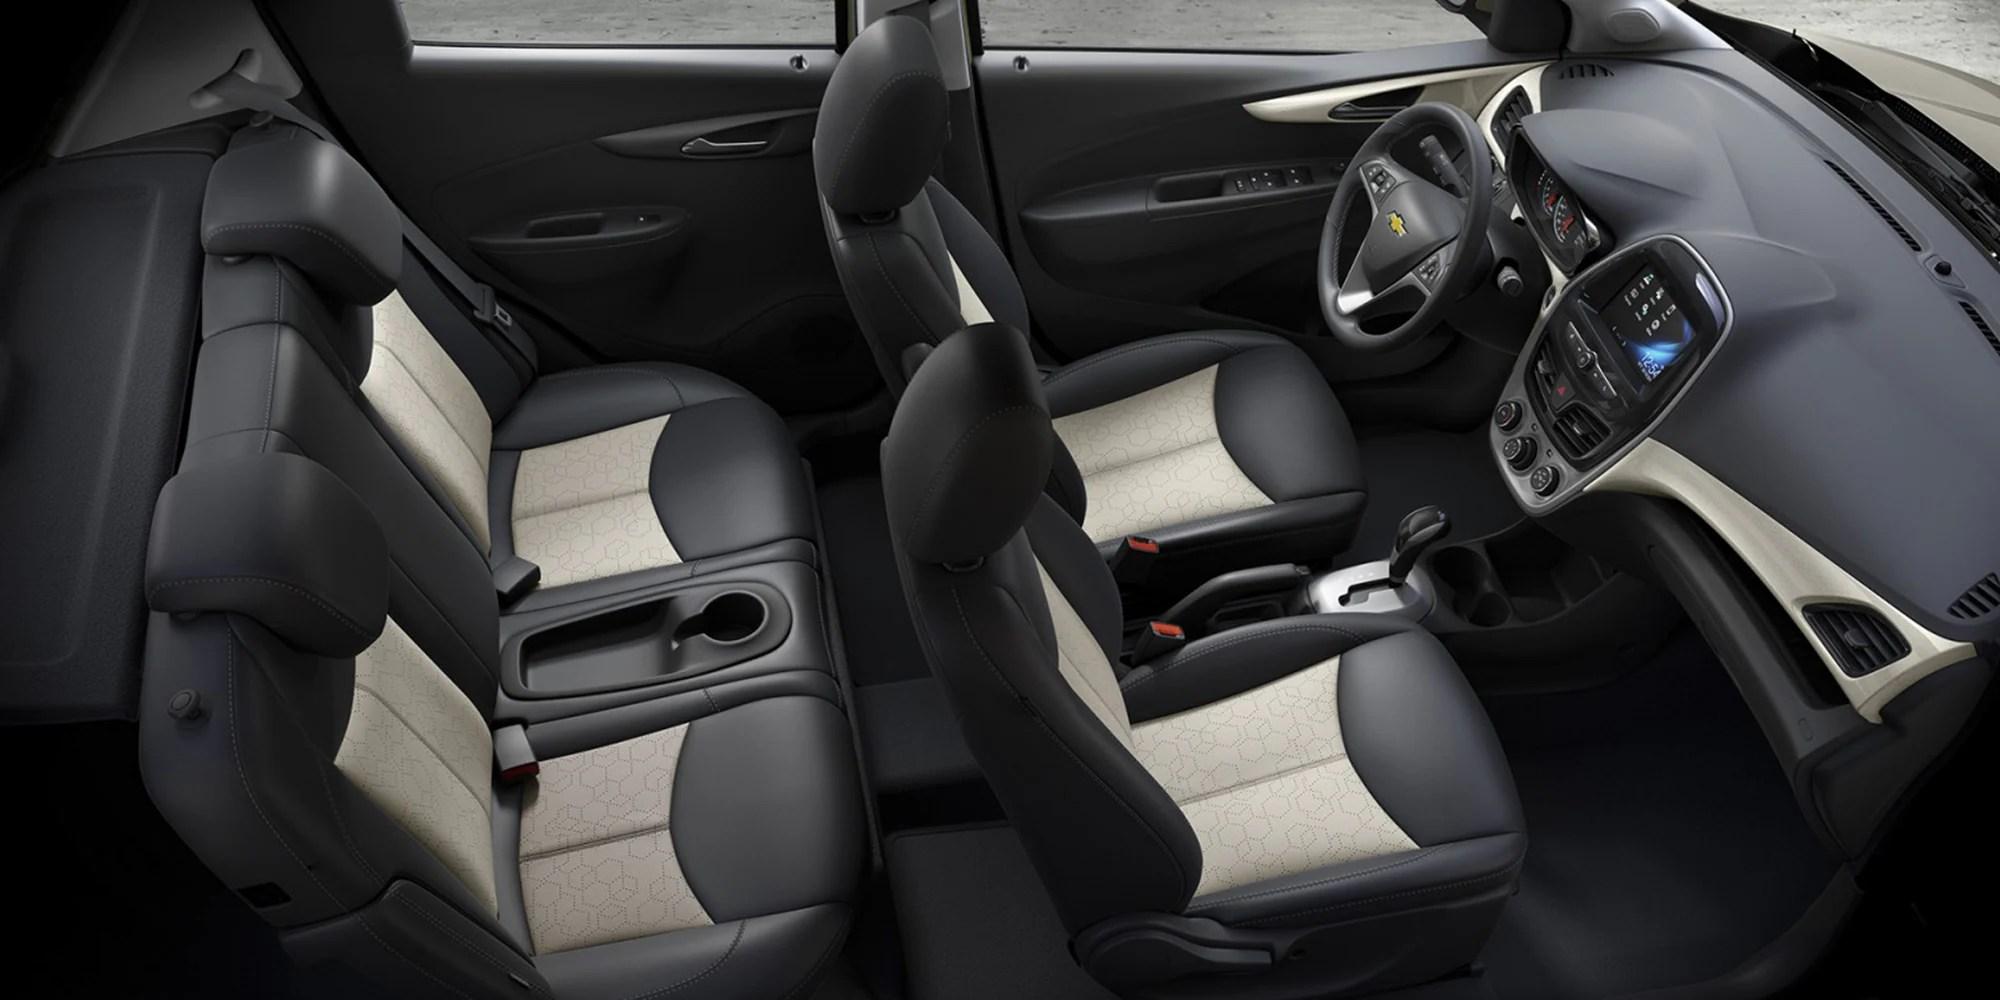 hight resolution of chevrolet 2018 spark city car design interior seats